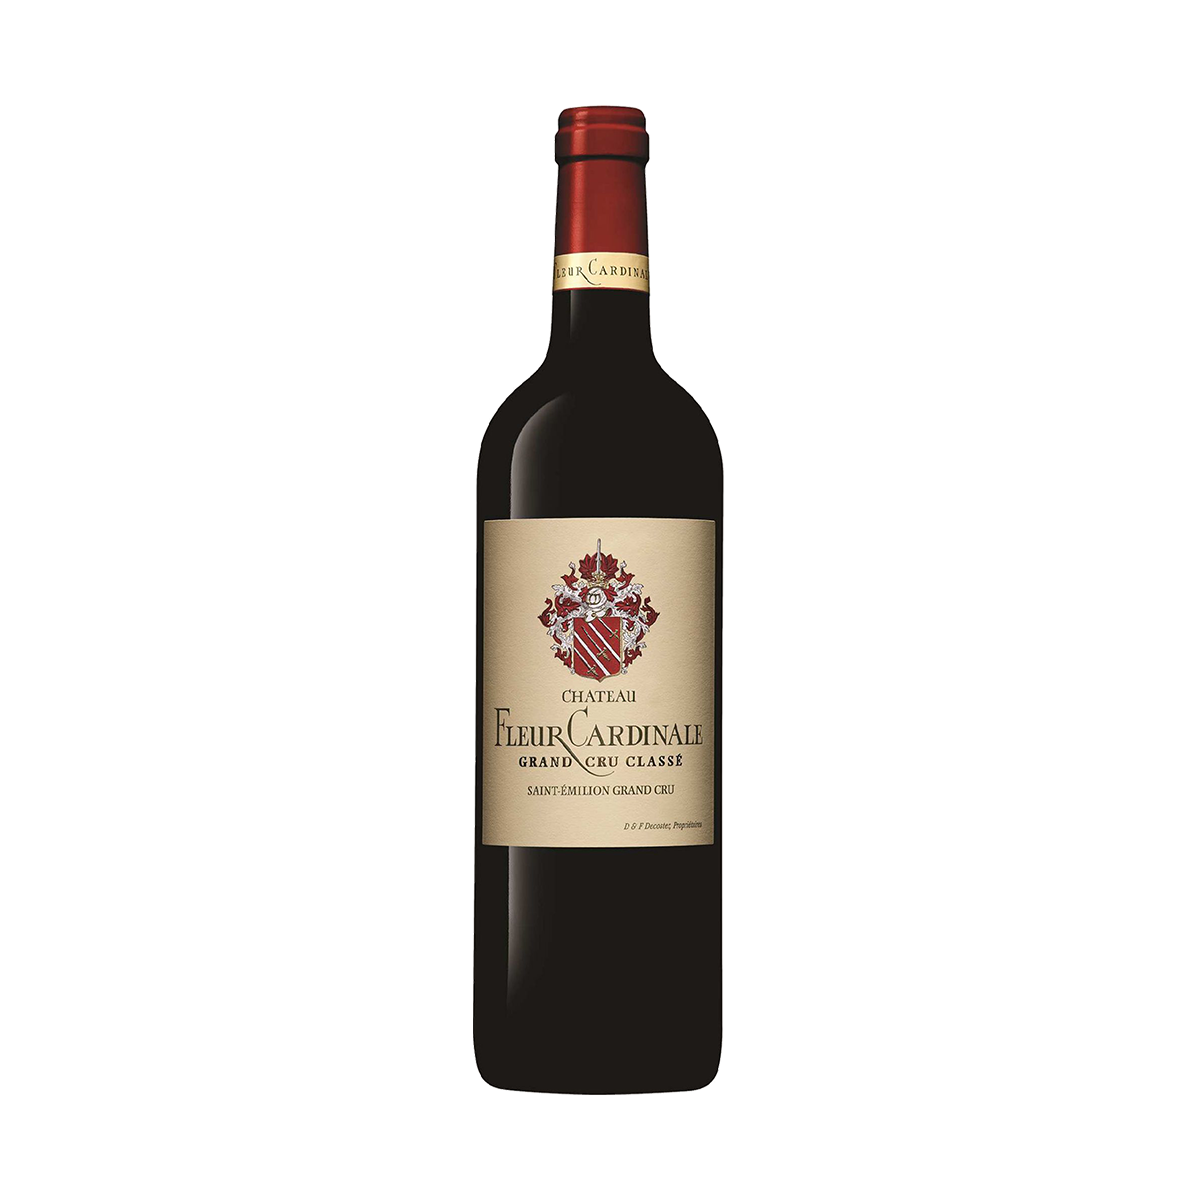 FRB1301-12 法國花妃列級酒莊特級聖愛美濃紅酒 Château Fleur Cardinale Saint-Émilion Grand Cru A.O.C. Grand Cru Classé